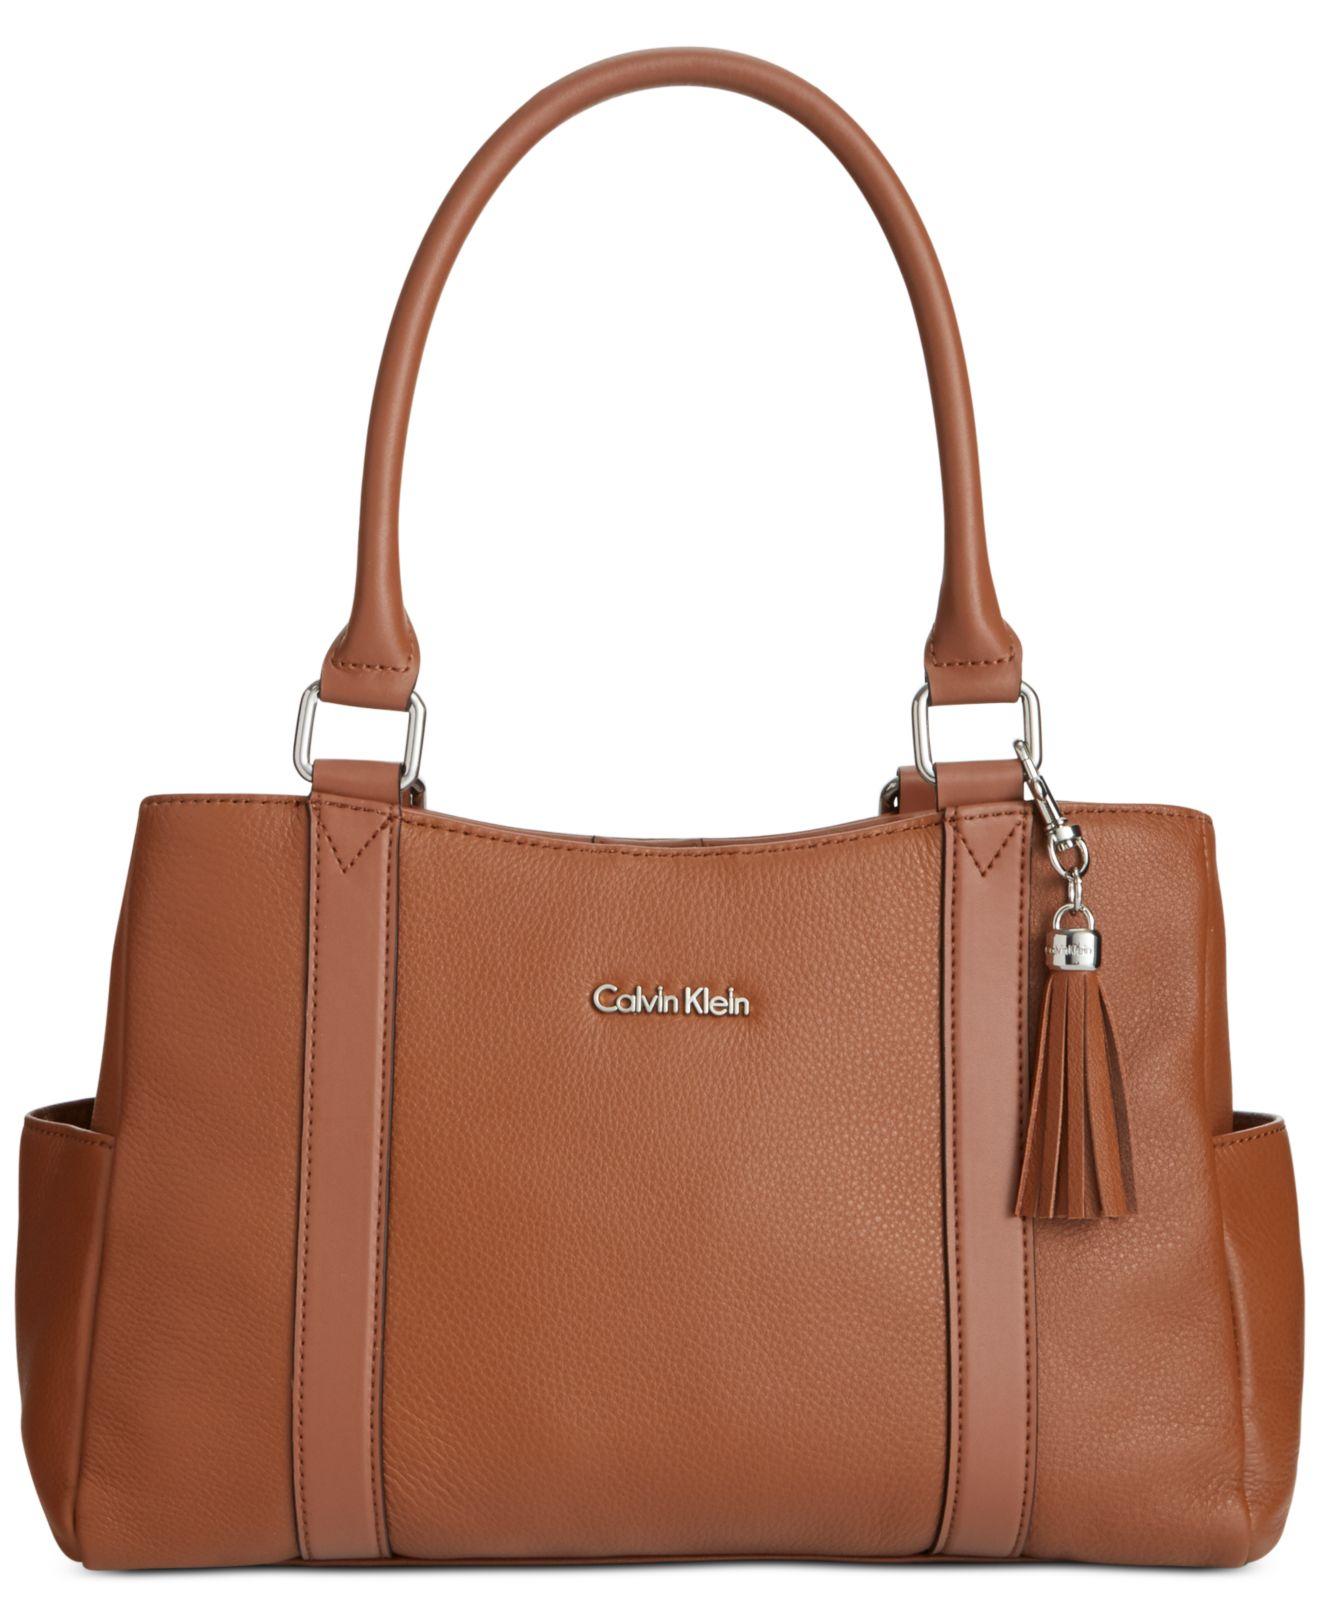 d4f7acc7dce Calvin Klein Modena Pebble Satchel in Brown - Lyst